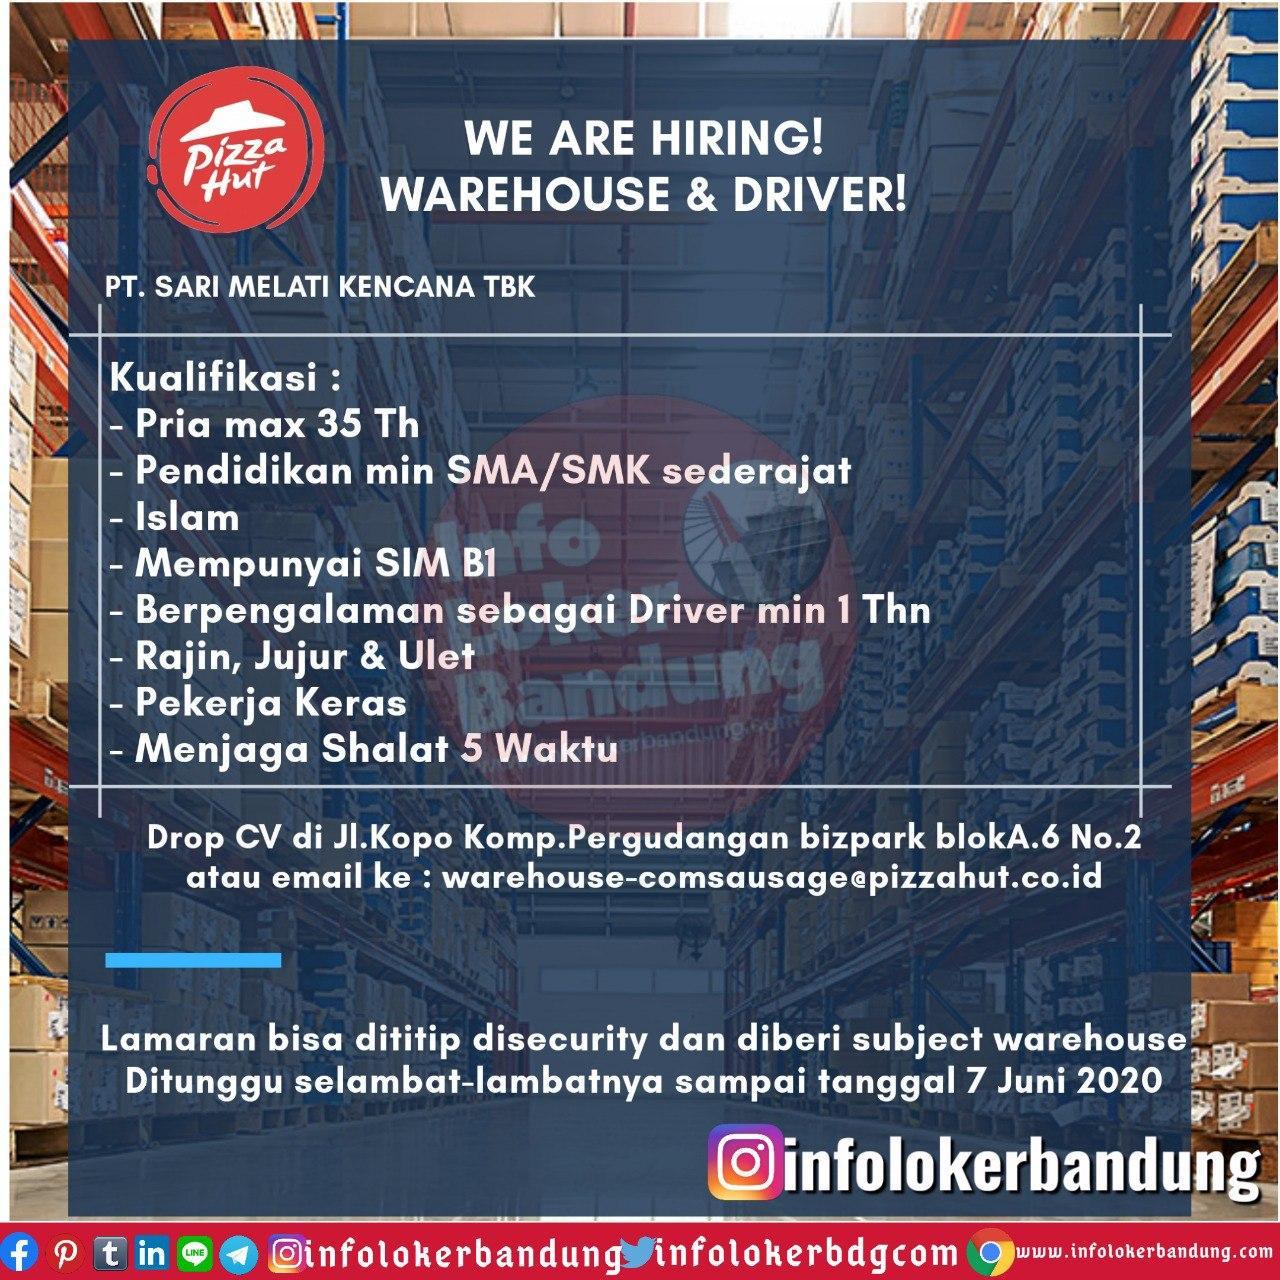 Lowongan Kerja Warehouse & Driver Pizza Hut PT. Sari Melati Kencana Tbk Bandung Mei 2020